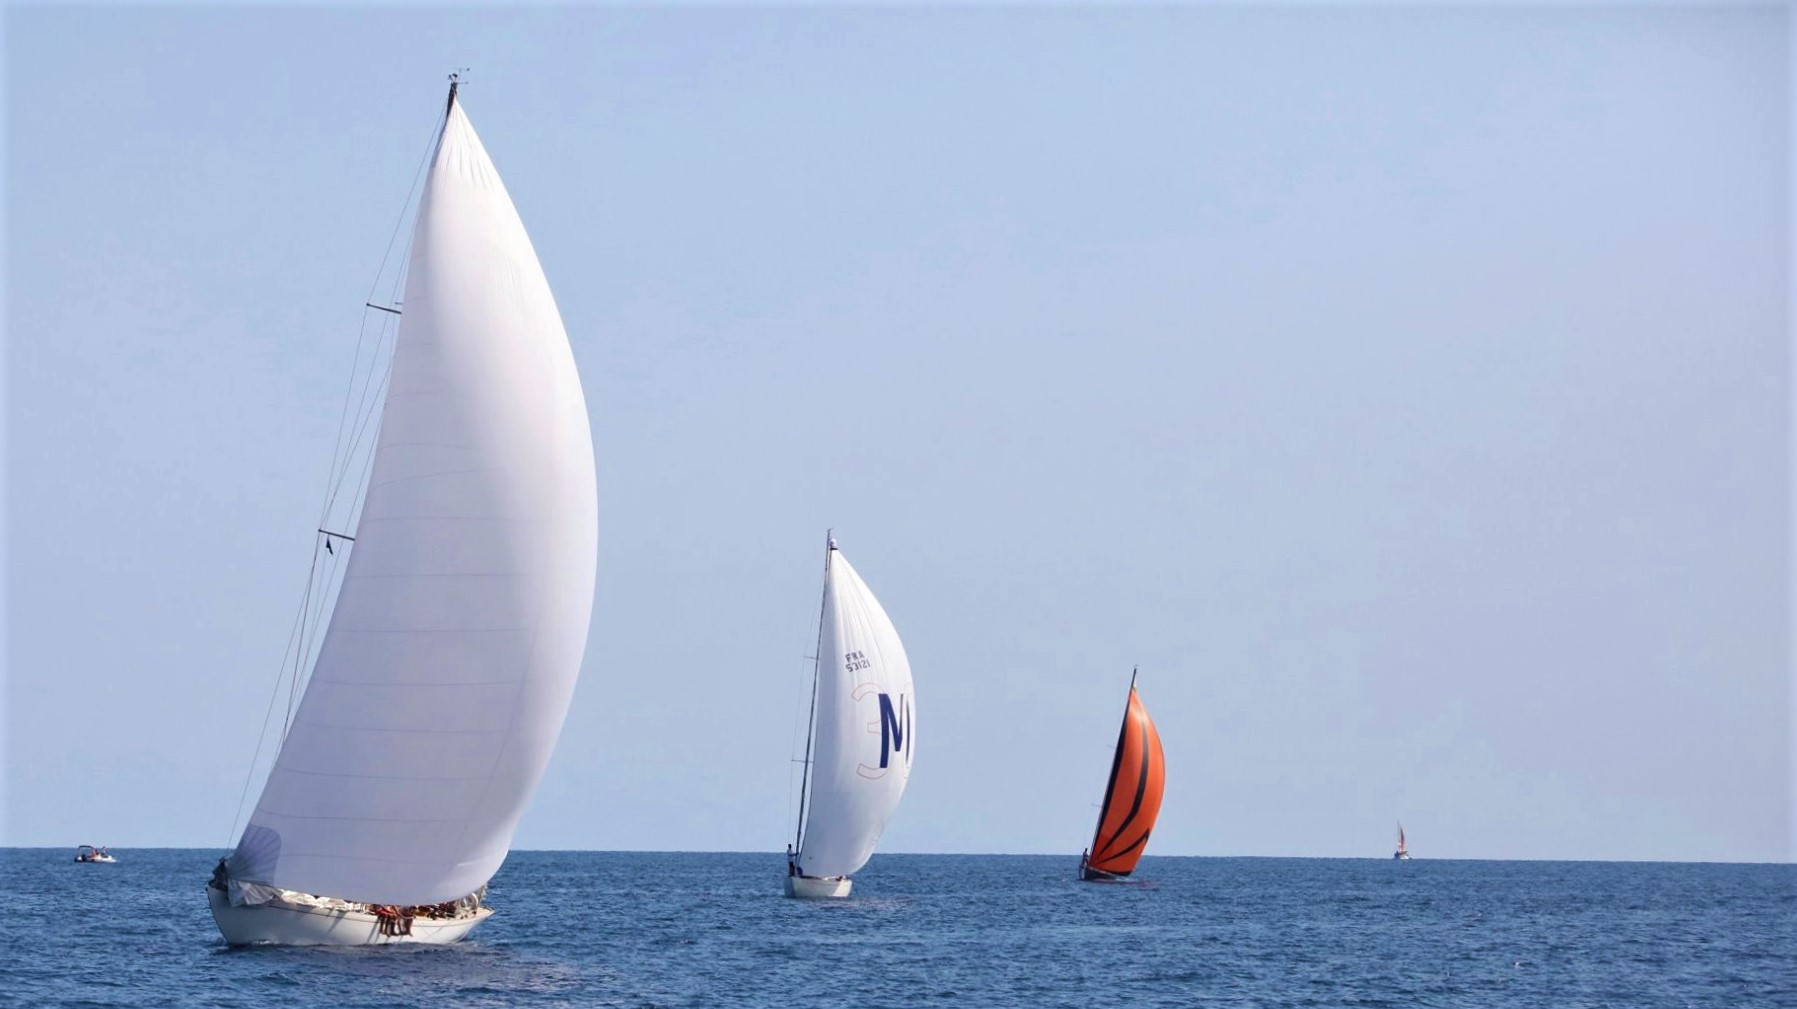 Taverna ligne d'arrivé SY Eileen vs SY Quatre Quarts III Vs Hounbonne IV  Corsica Classic 2019 Photo Françoise Tafani DR